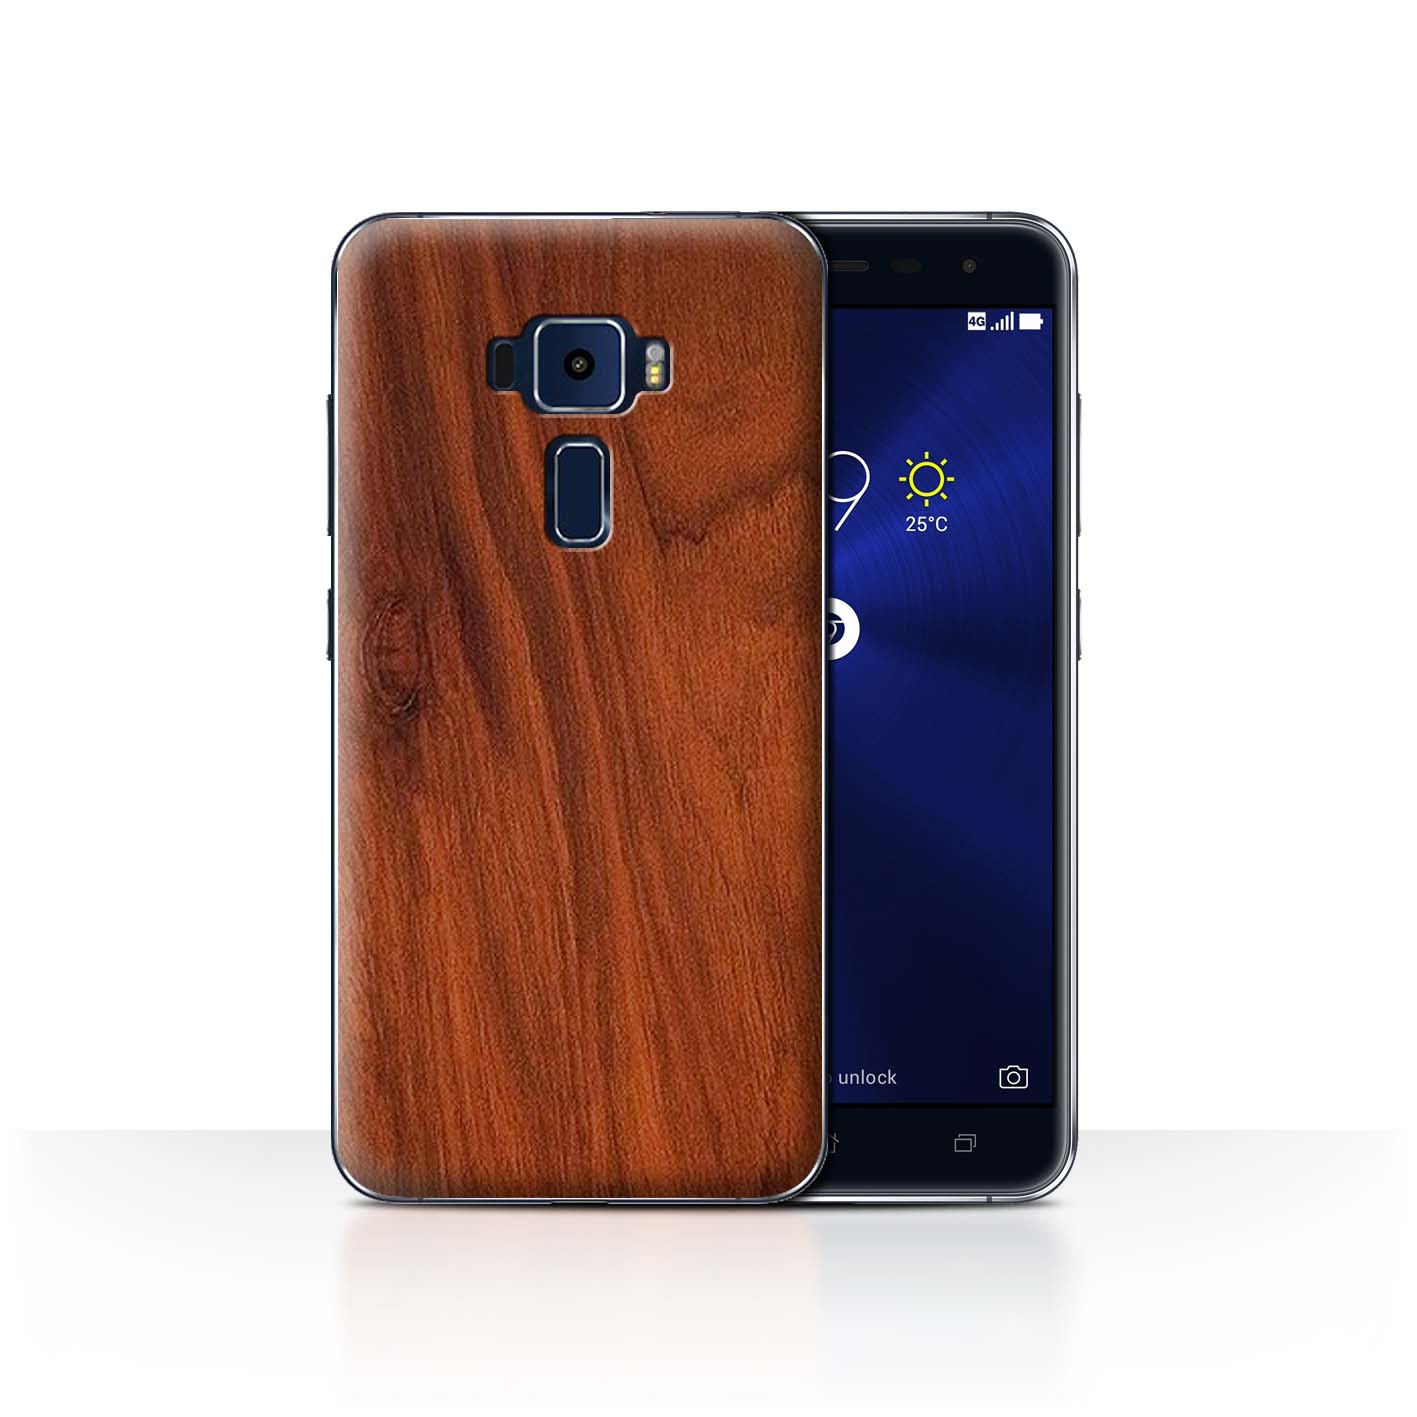 STUFF4-Back-Case-Cover-Skin-for-Asus-Zenfone-3-ZE552KL-Wood-Grain-Effect-Pattern